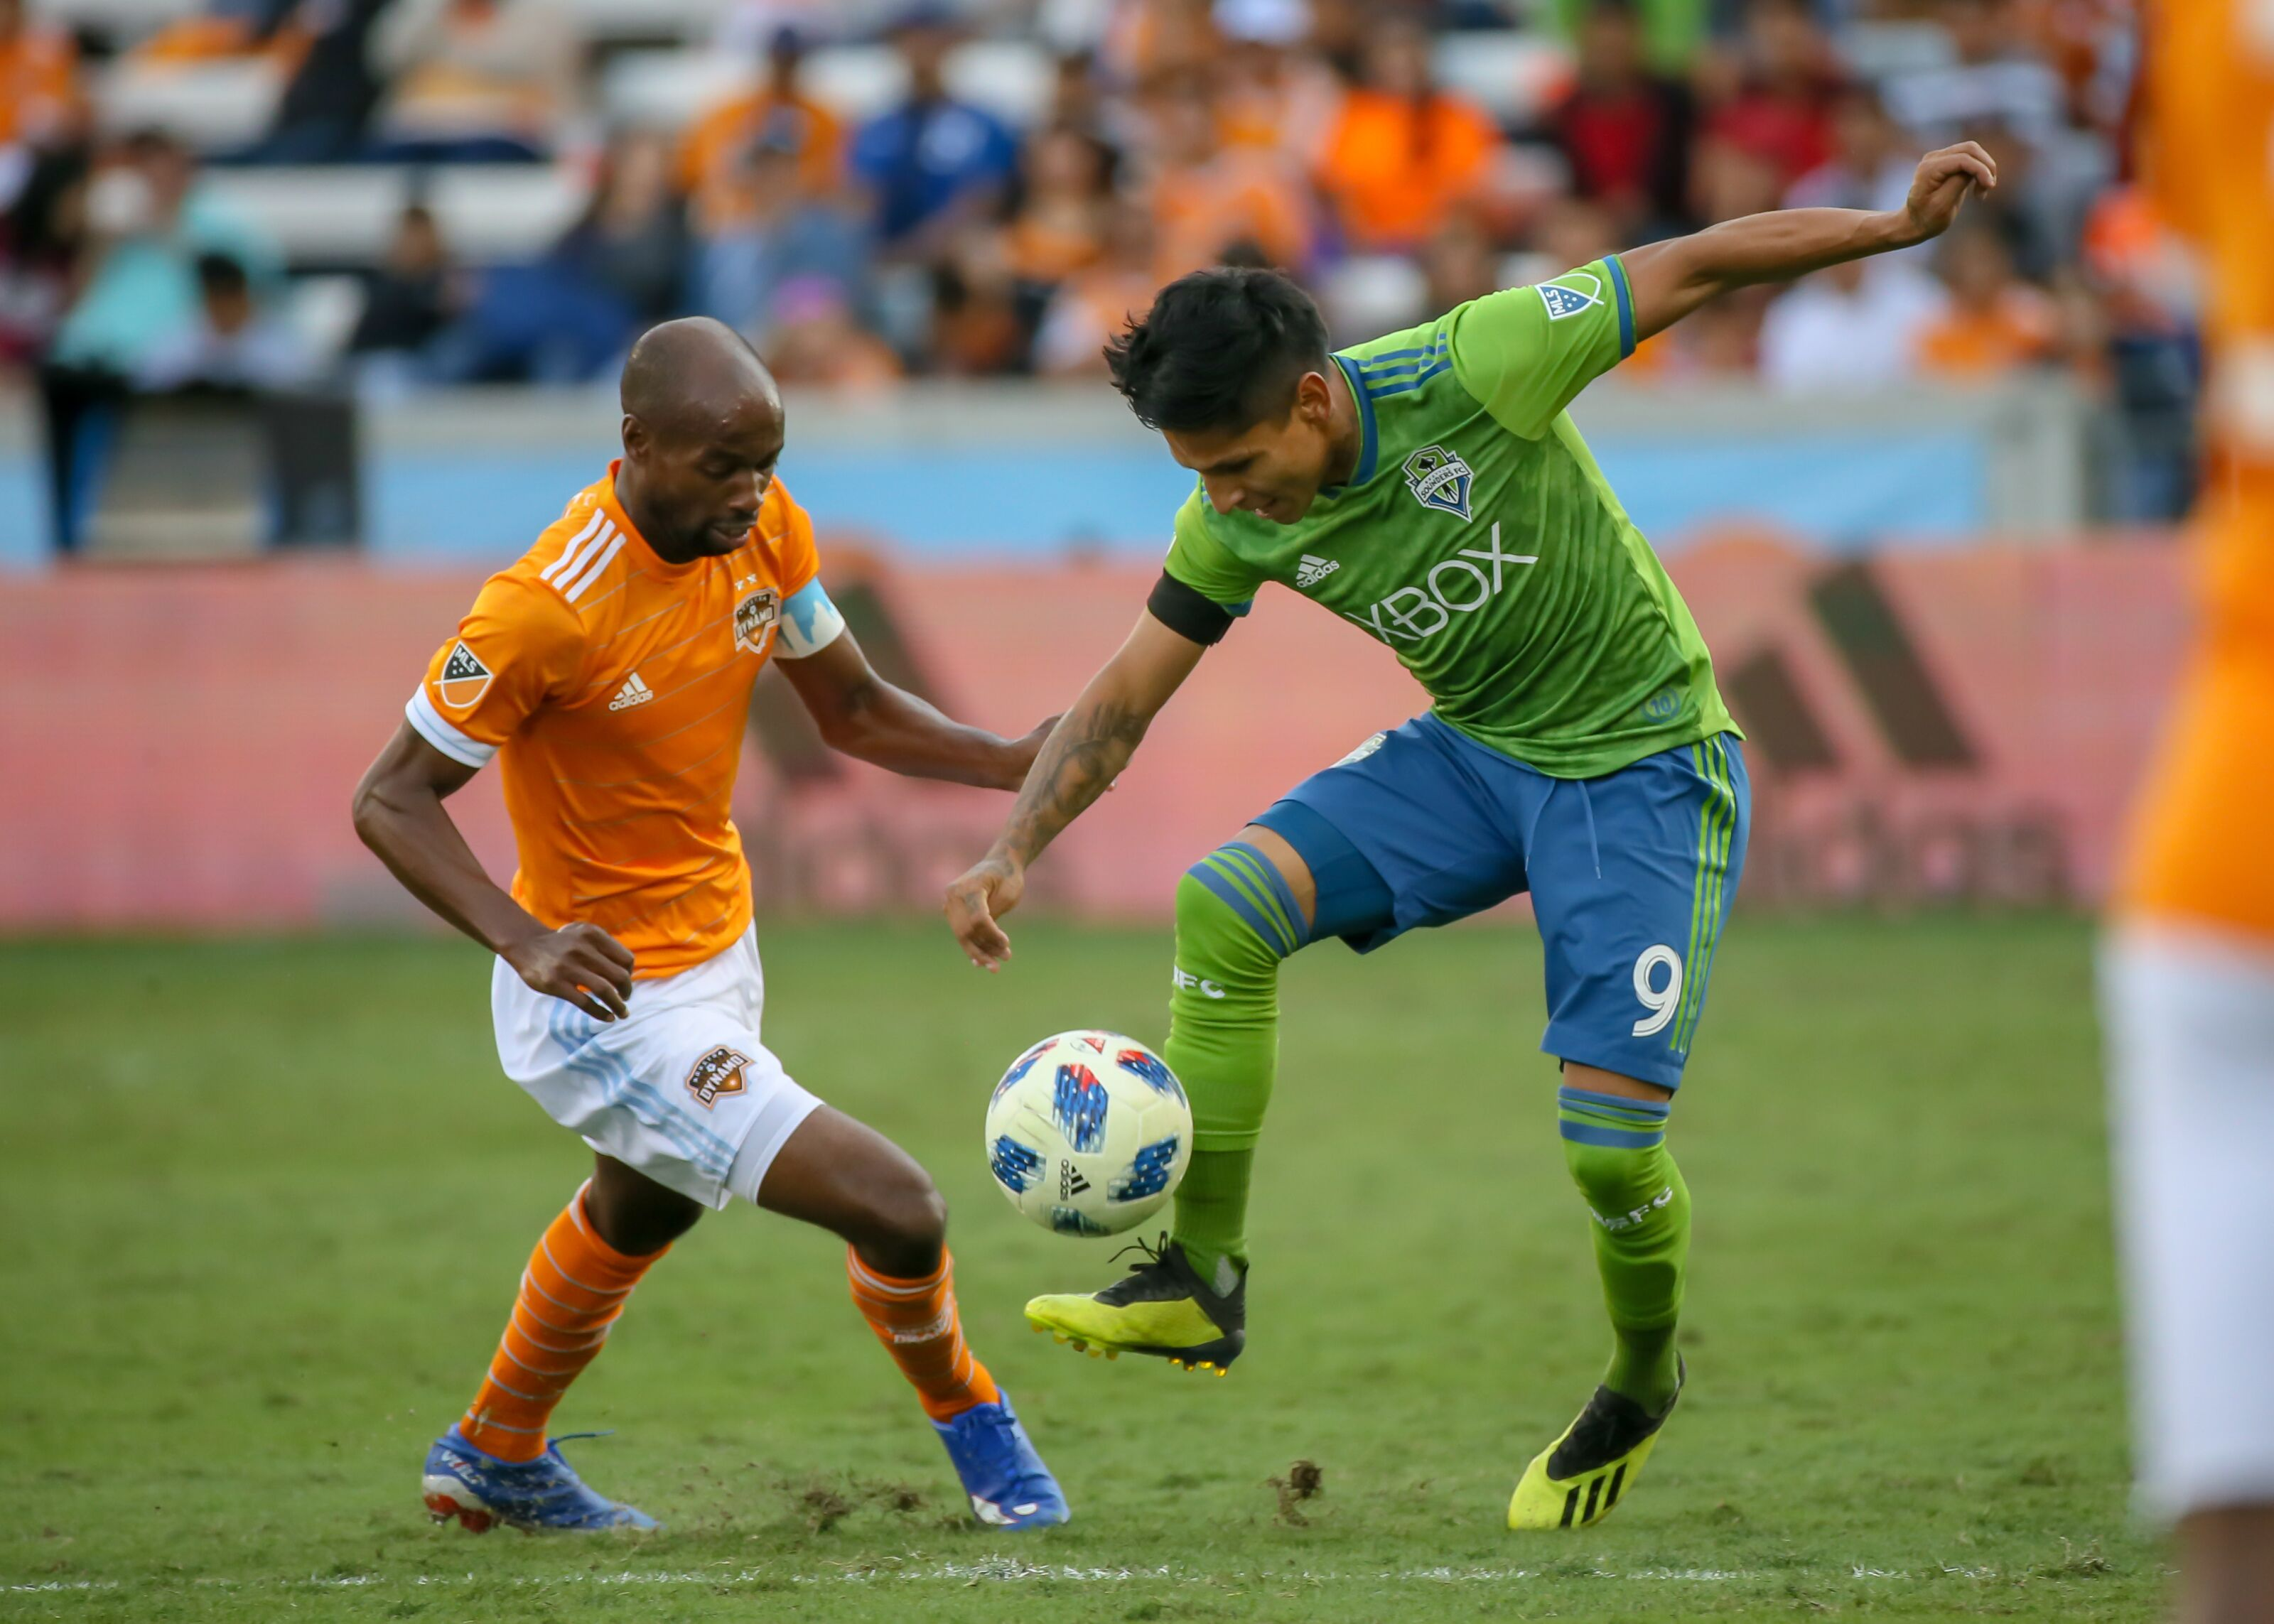 Houston Dynamo: DaMarcus Beasley must be signed soon